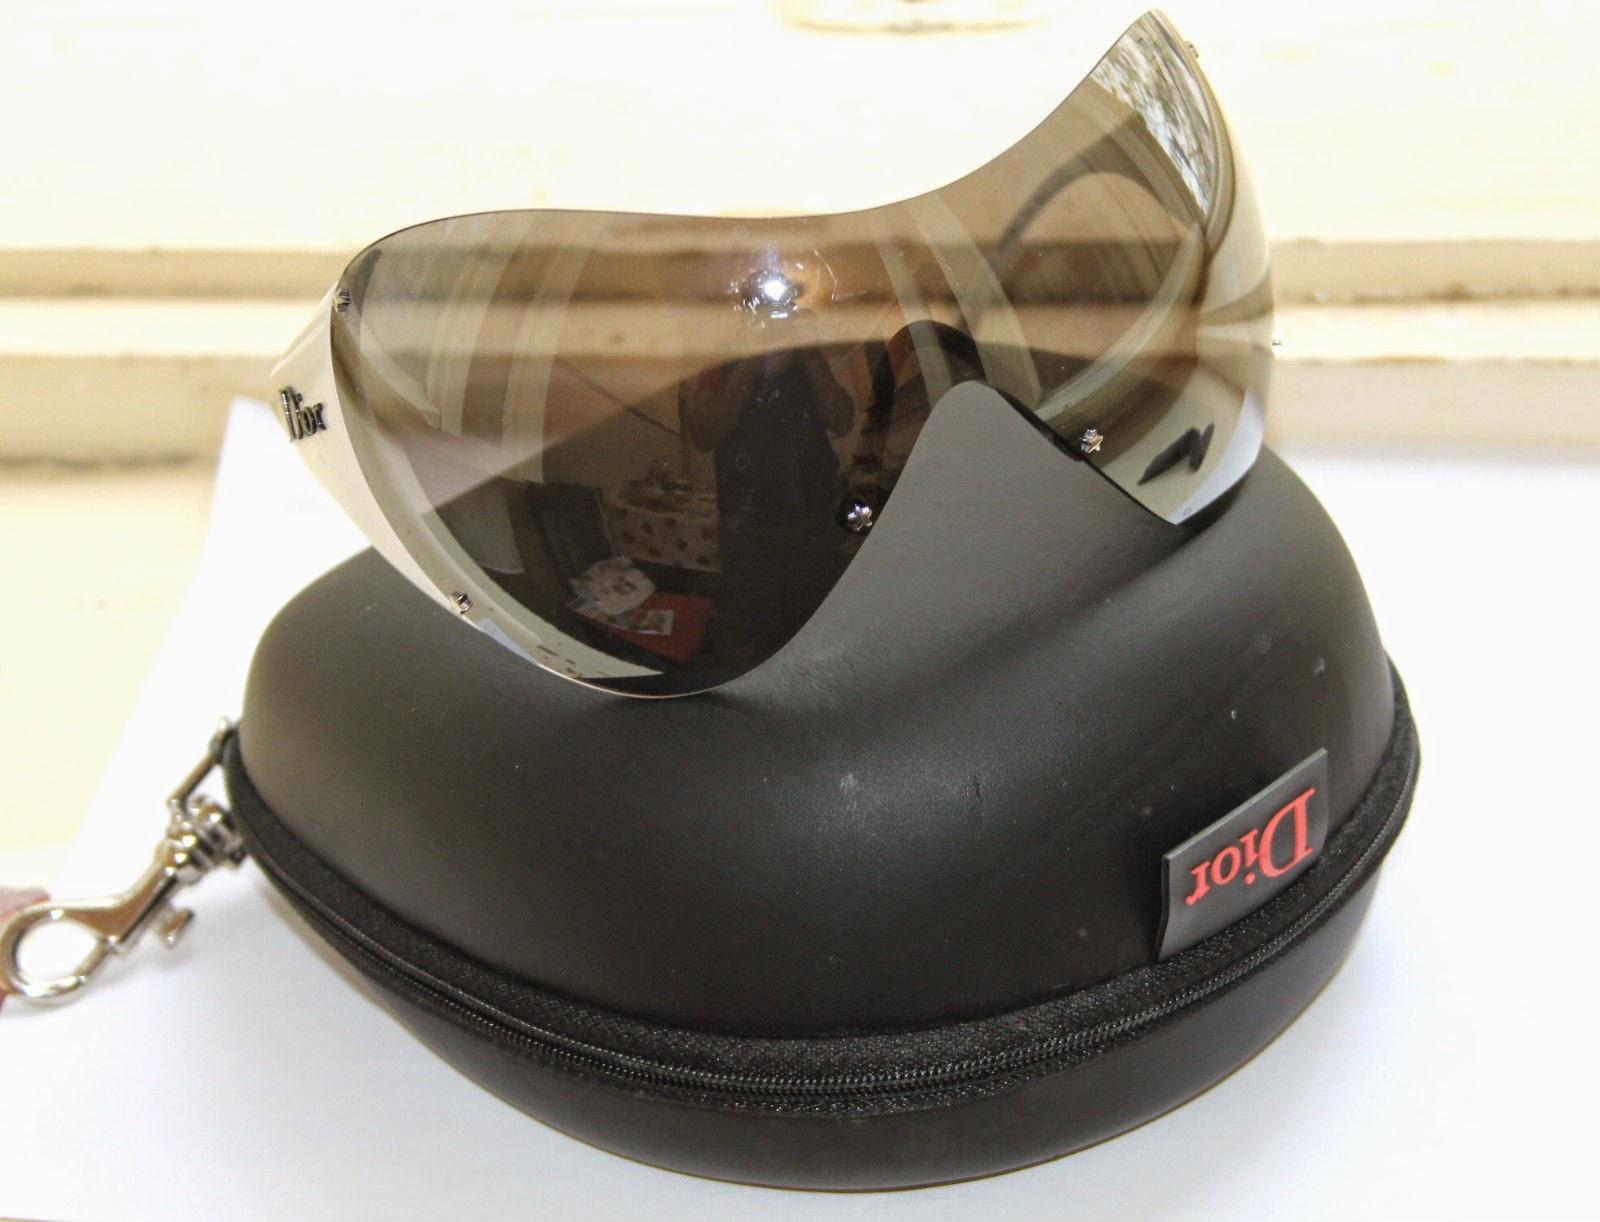 9c464cb458 secondhandsunglasses  Christian Dior Ski1 9A5 Sunglasses Sport Ski ...